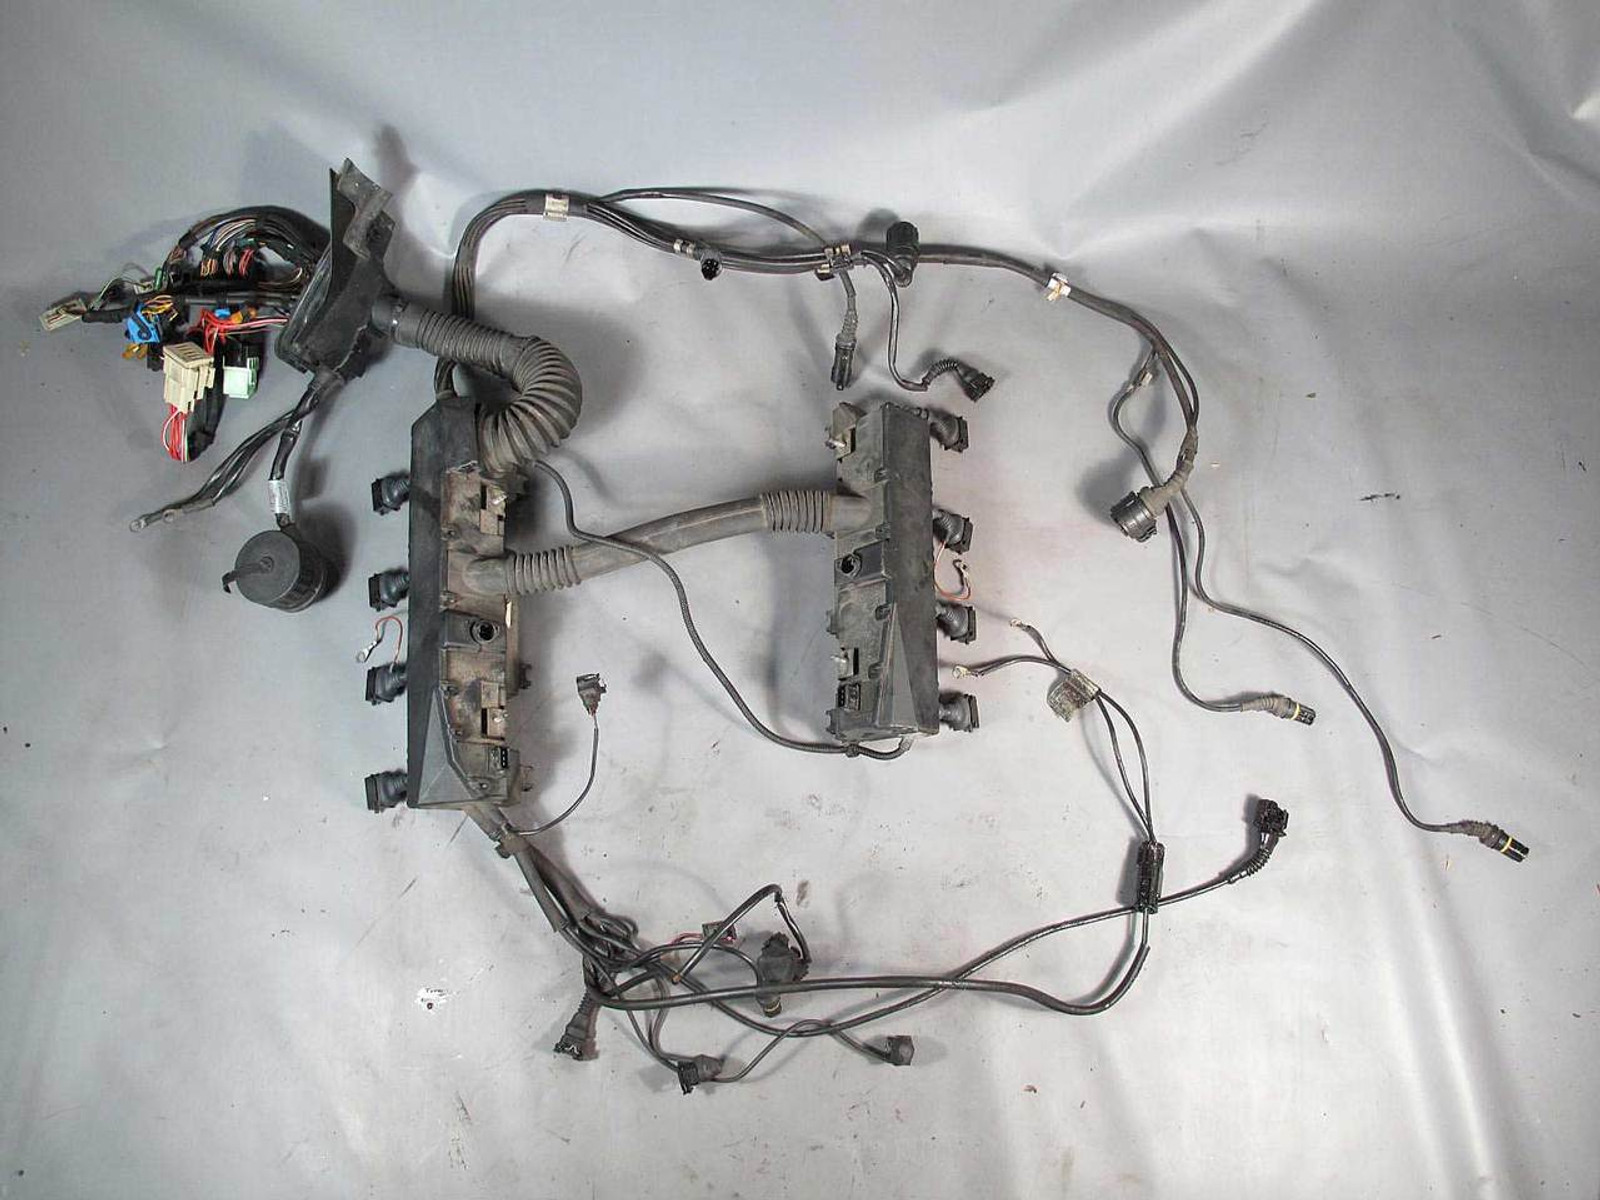 BMW E38 740i 740iL M62TU 4.4L V8 Engine Wiring Harness Complete 1999-2000  USED - 7628 - Prussian MotorsPrussian Motors